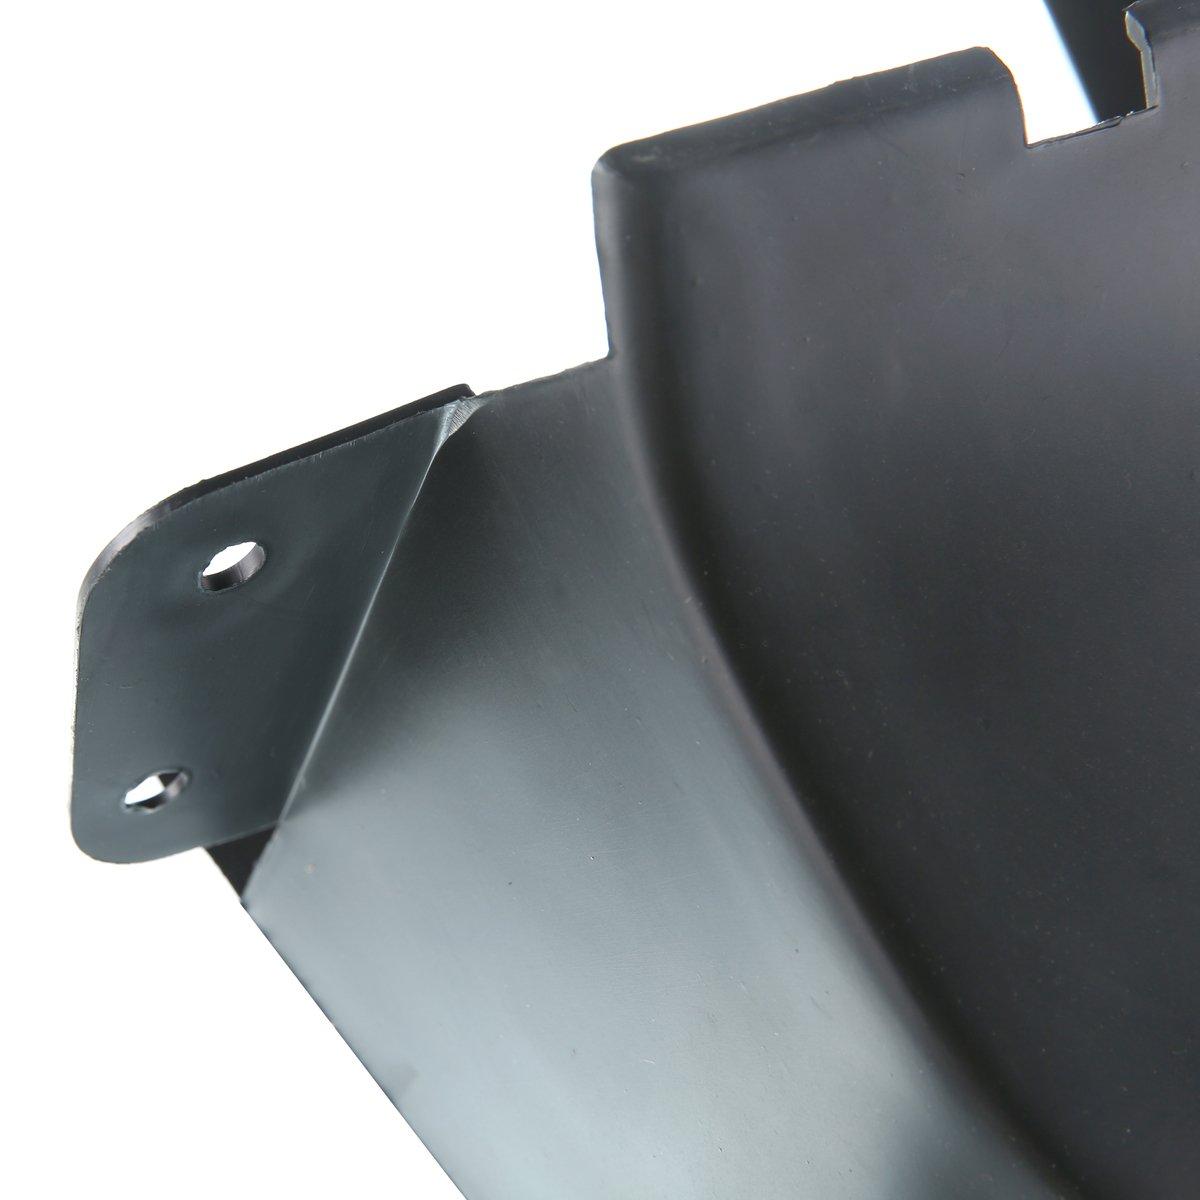 A-Premium Splash Guards Mud Flaps Mudflaps for Infiniti QX60 2014-2016 JX35 4-PC Set